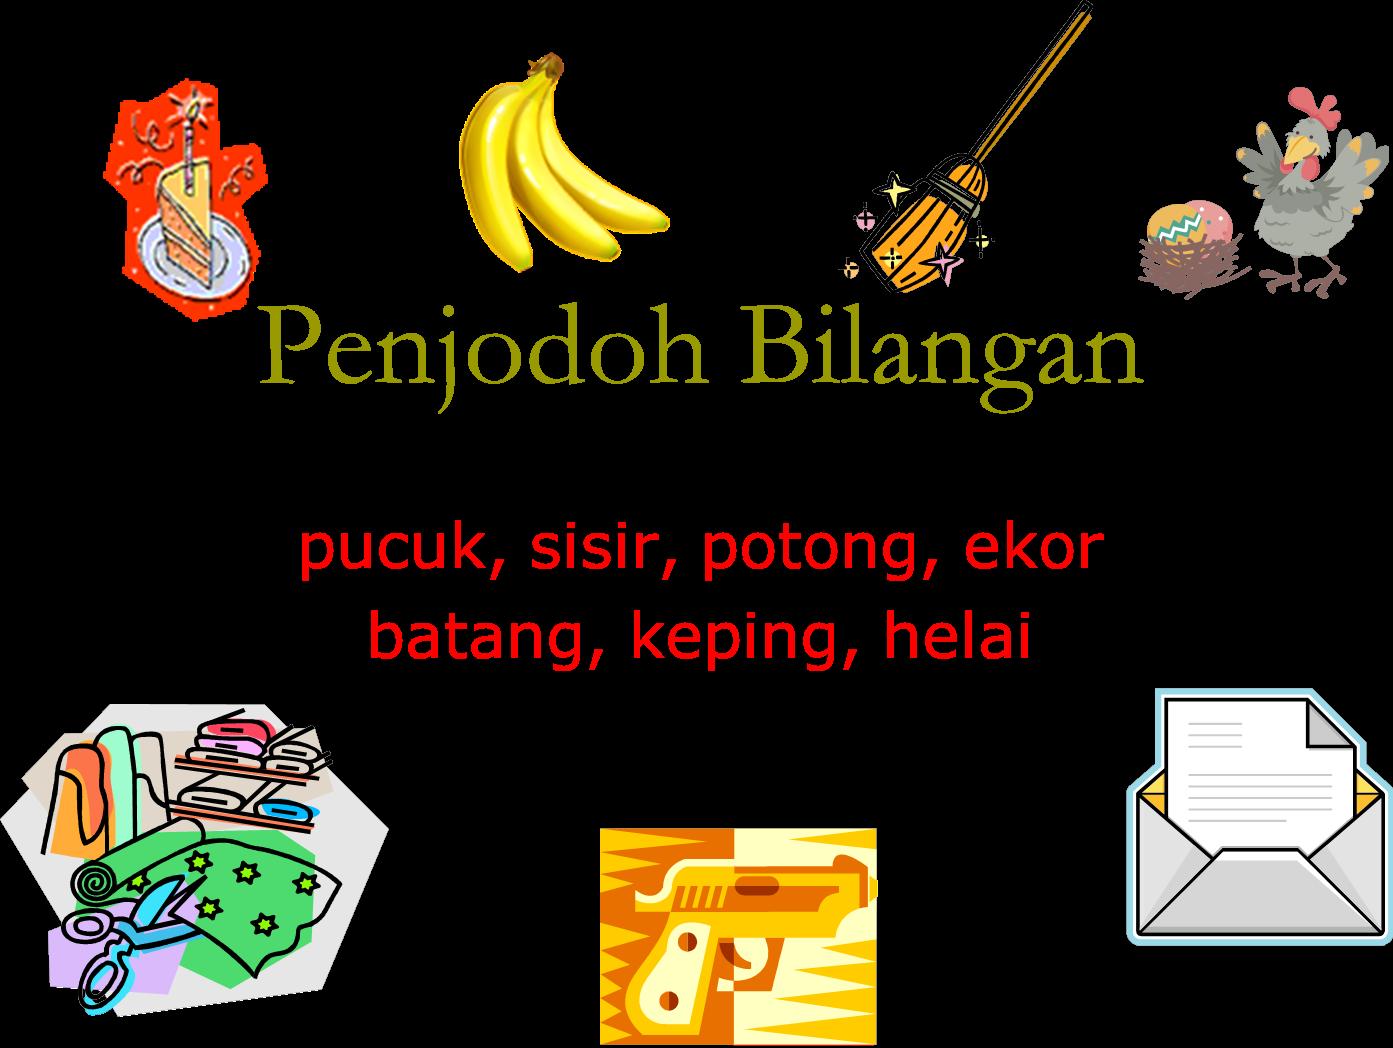 Pengajaran Bahasa Melayu Tahun Nota Penjodoh Bilangan